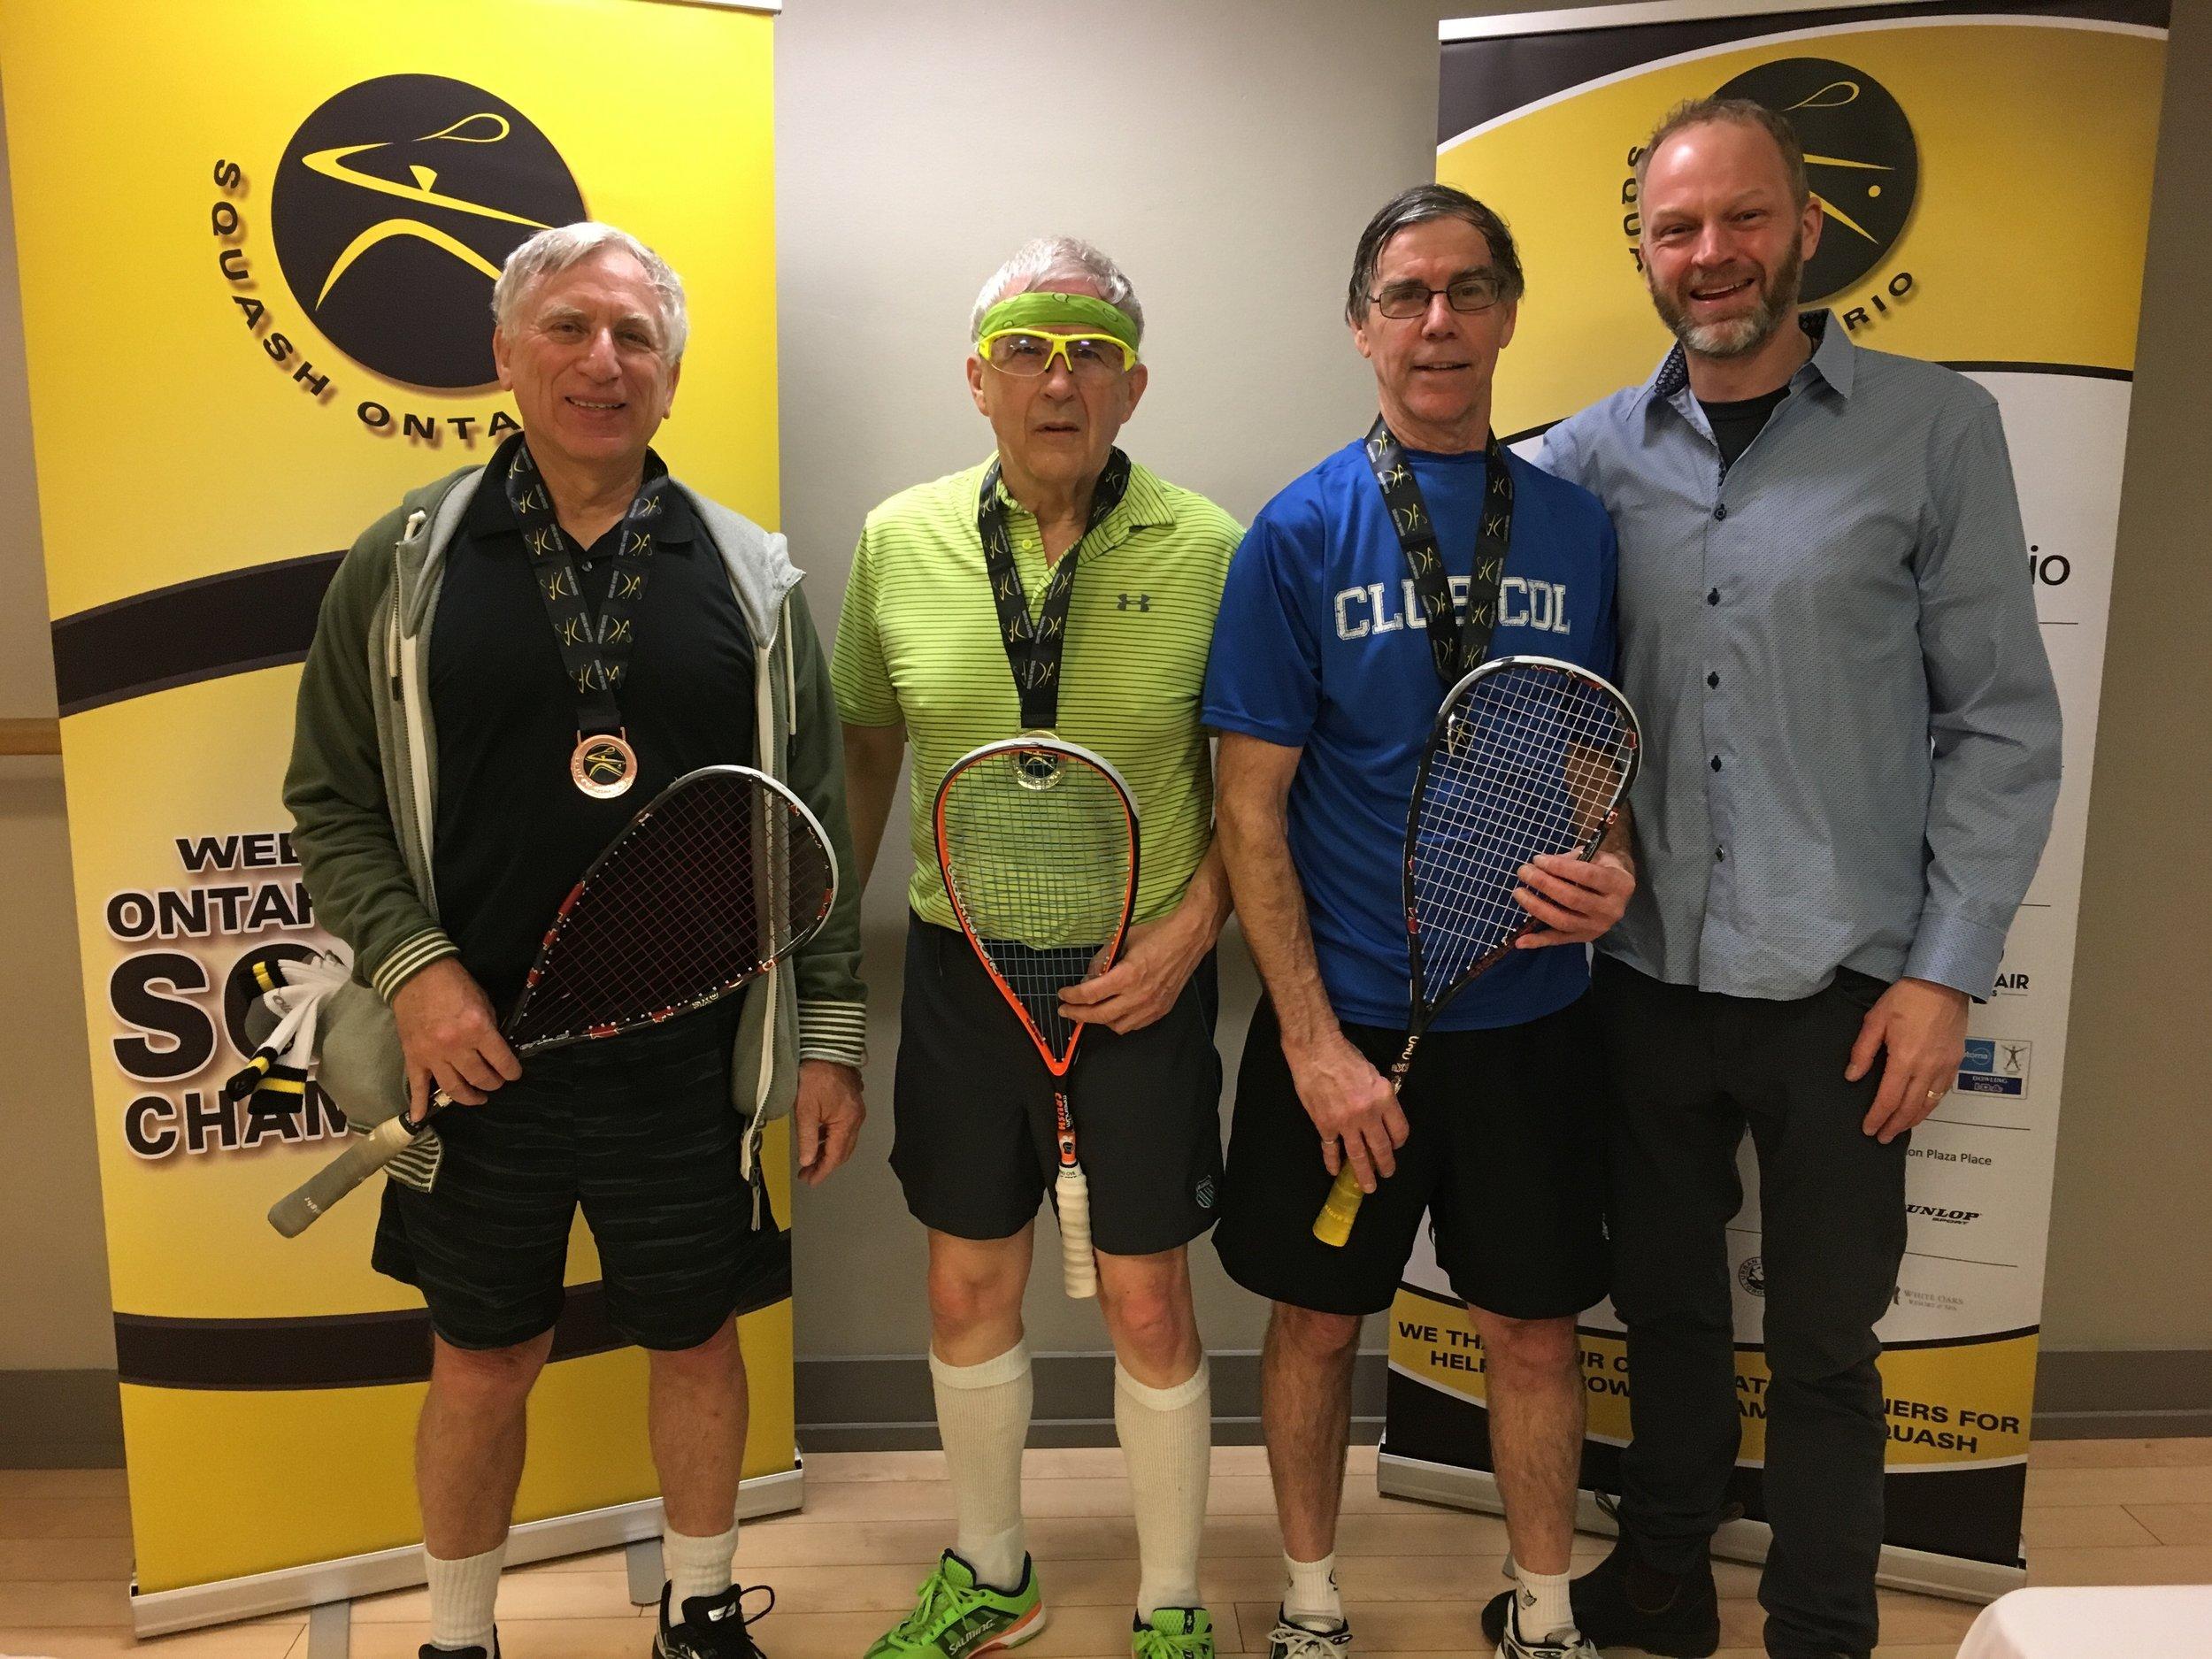 L-R: Allan Kogon, Robert De Valk, Gary W Grant, Squash Ontario's President Bruce Marrison